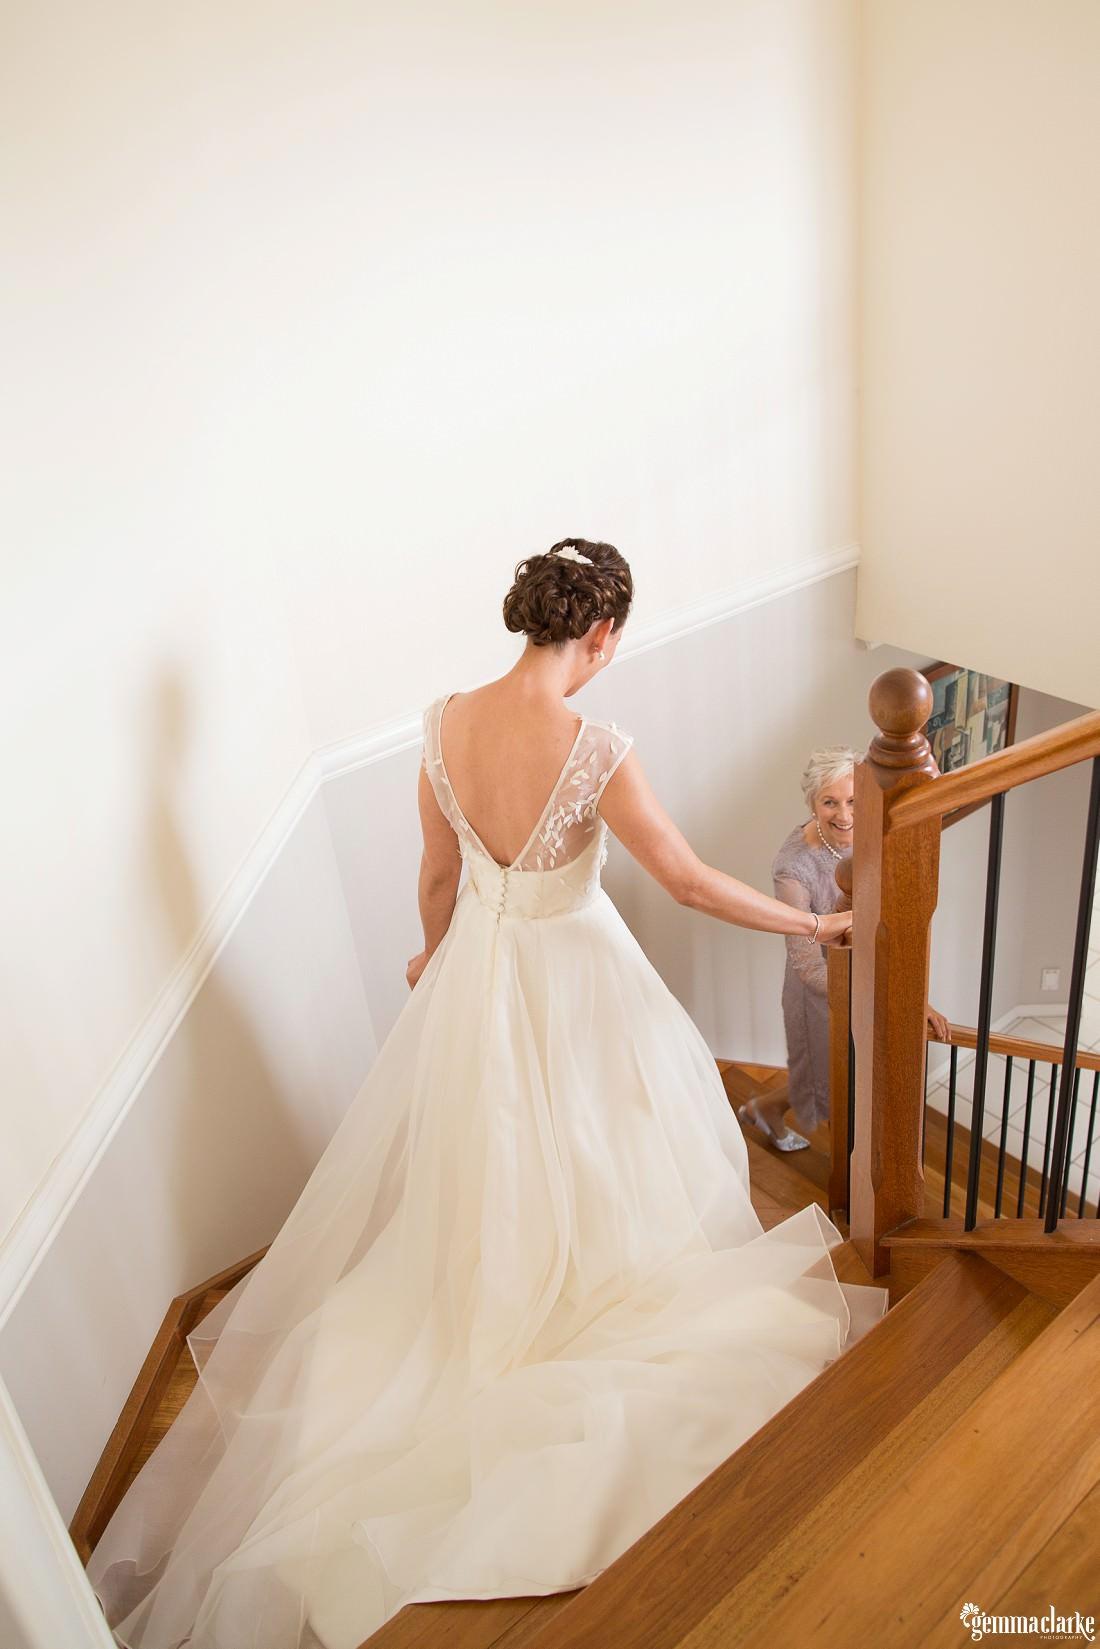 gemma-clarke-photography_kings-school-wedding_balmoral-beach-reception_bathers-pavilion-wedding_luisa-and-nick_0013